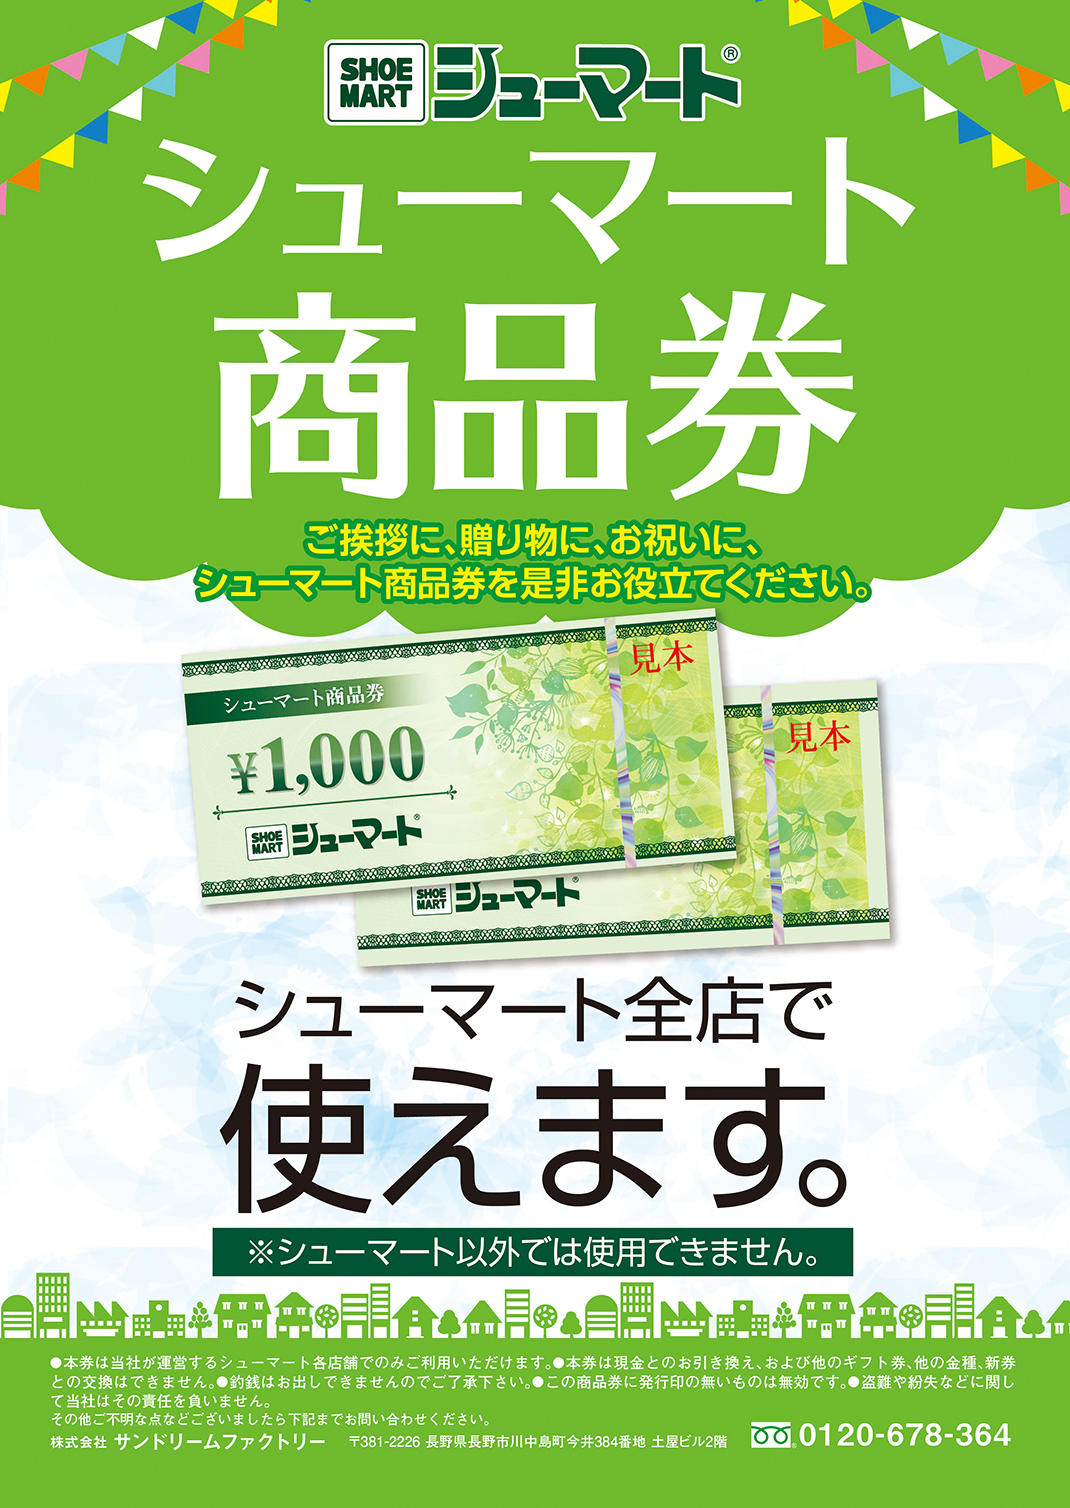 shoemart商品券.jpg